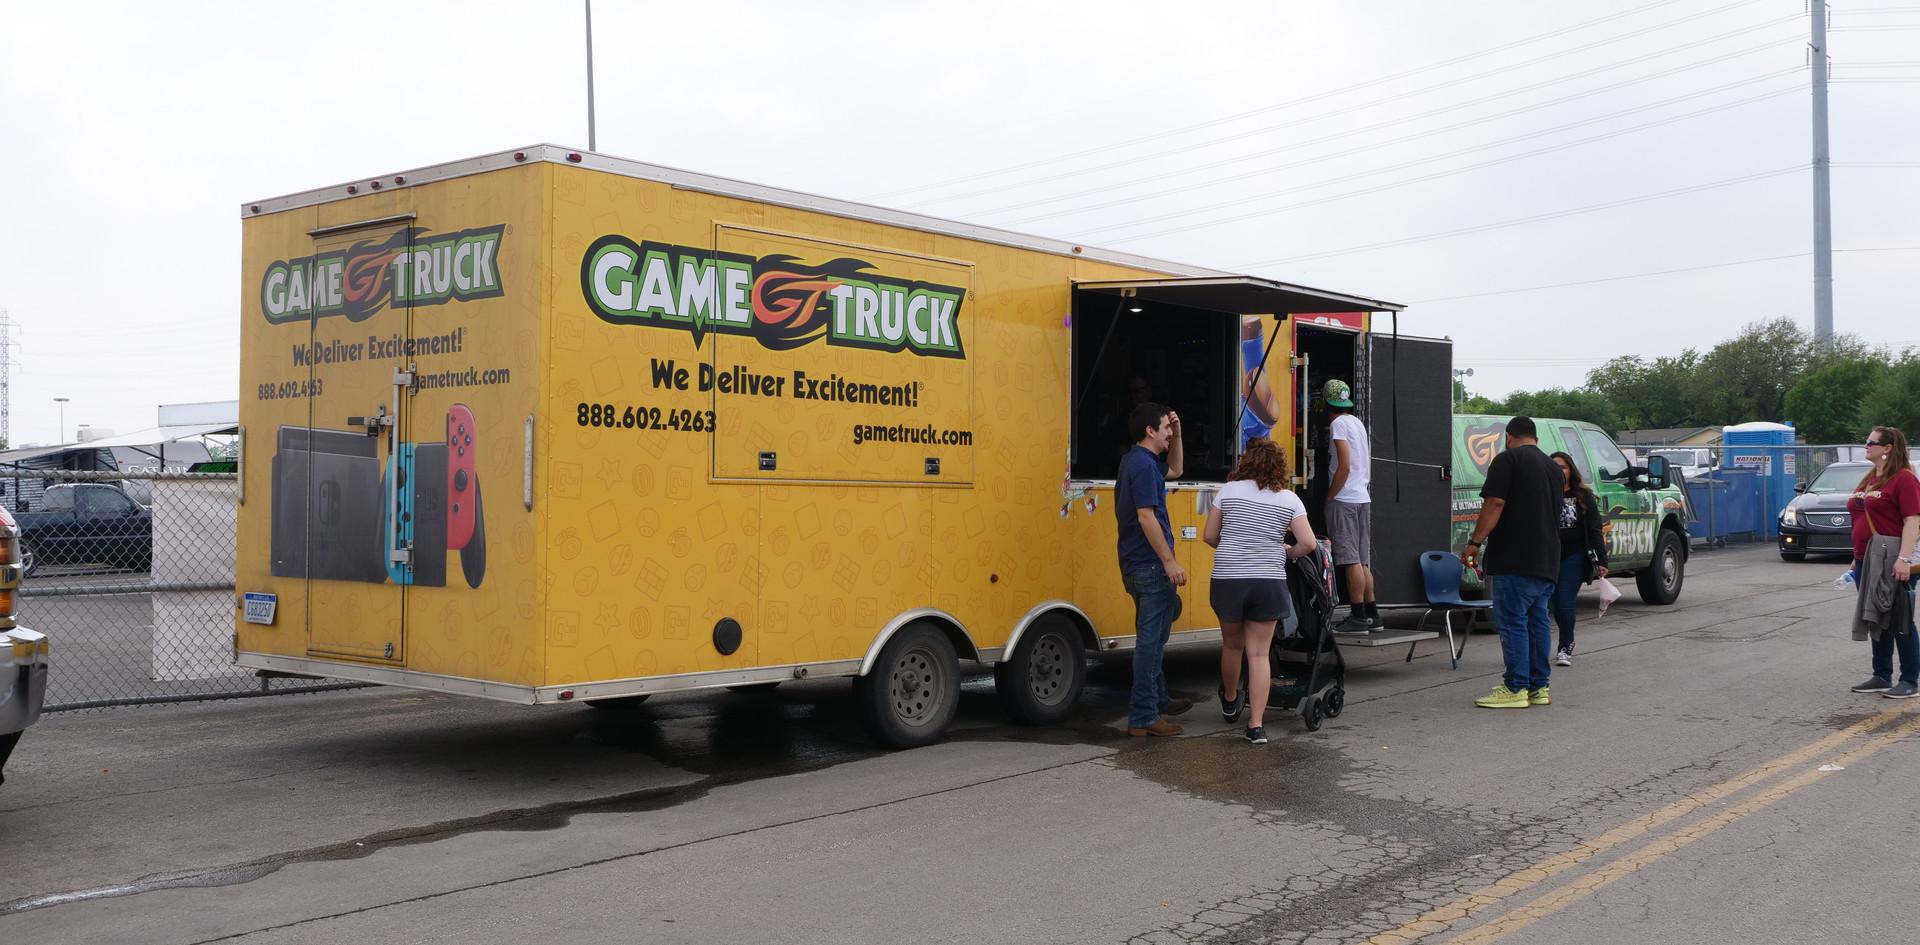 Gametruck at CarFest!